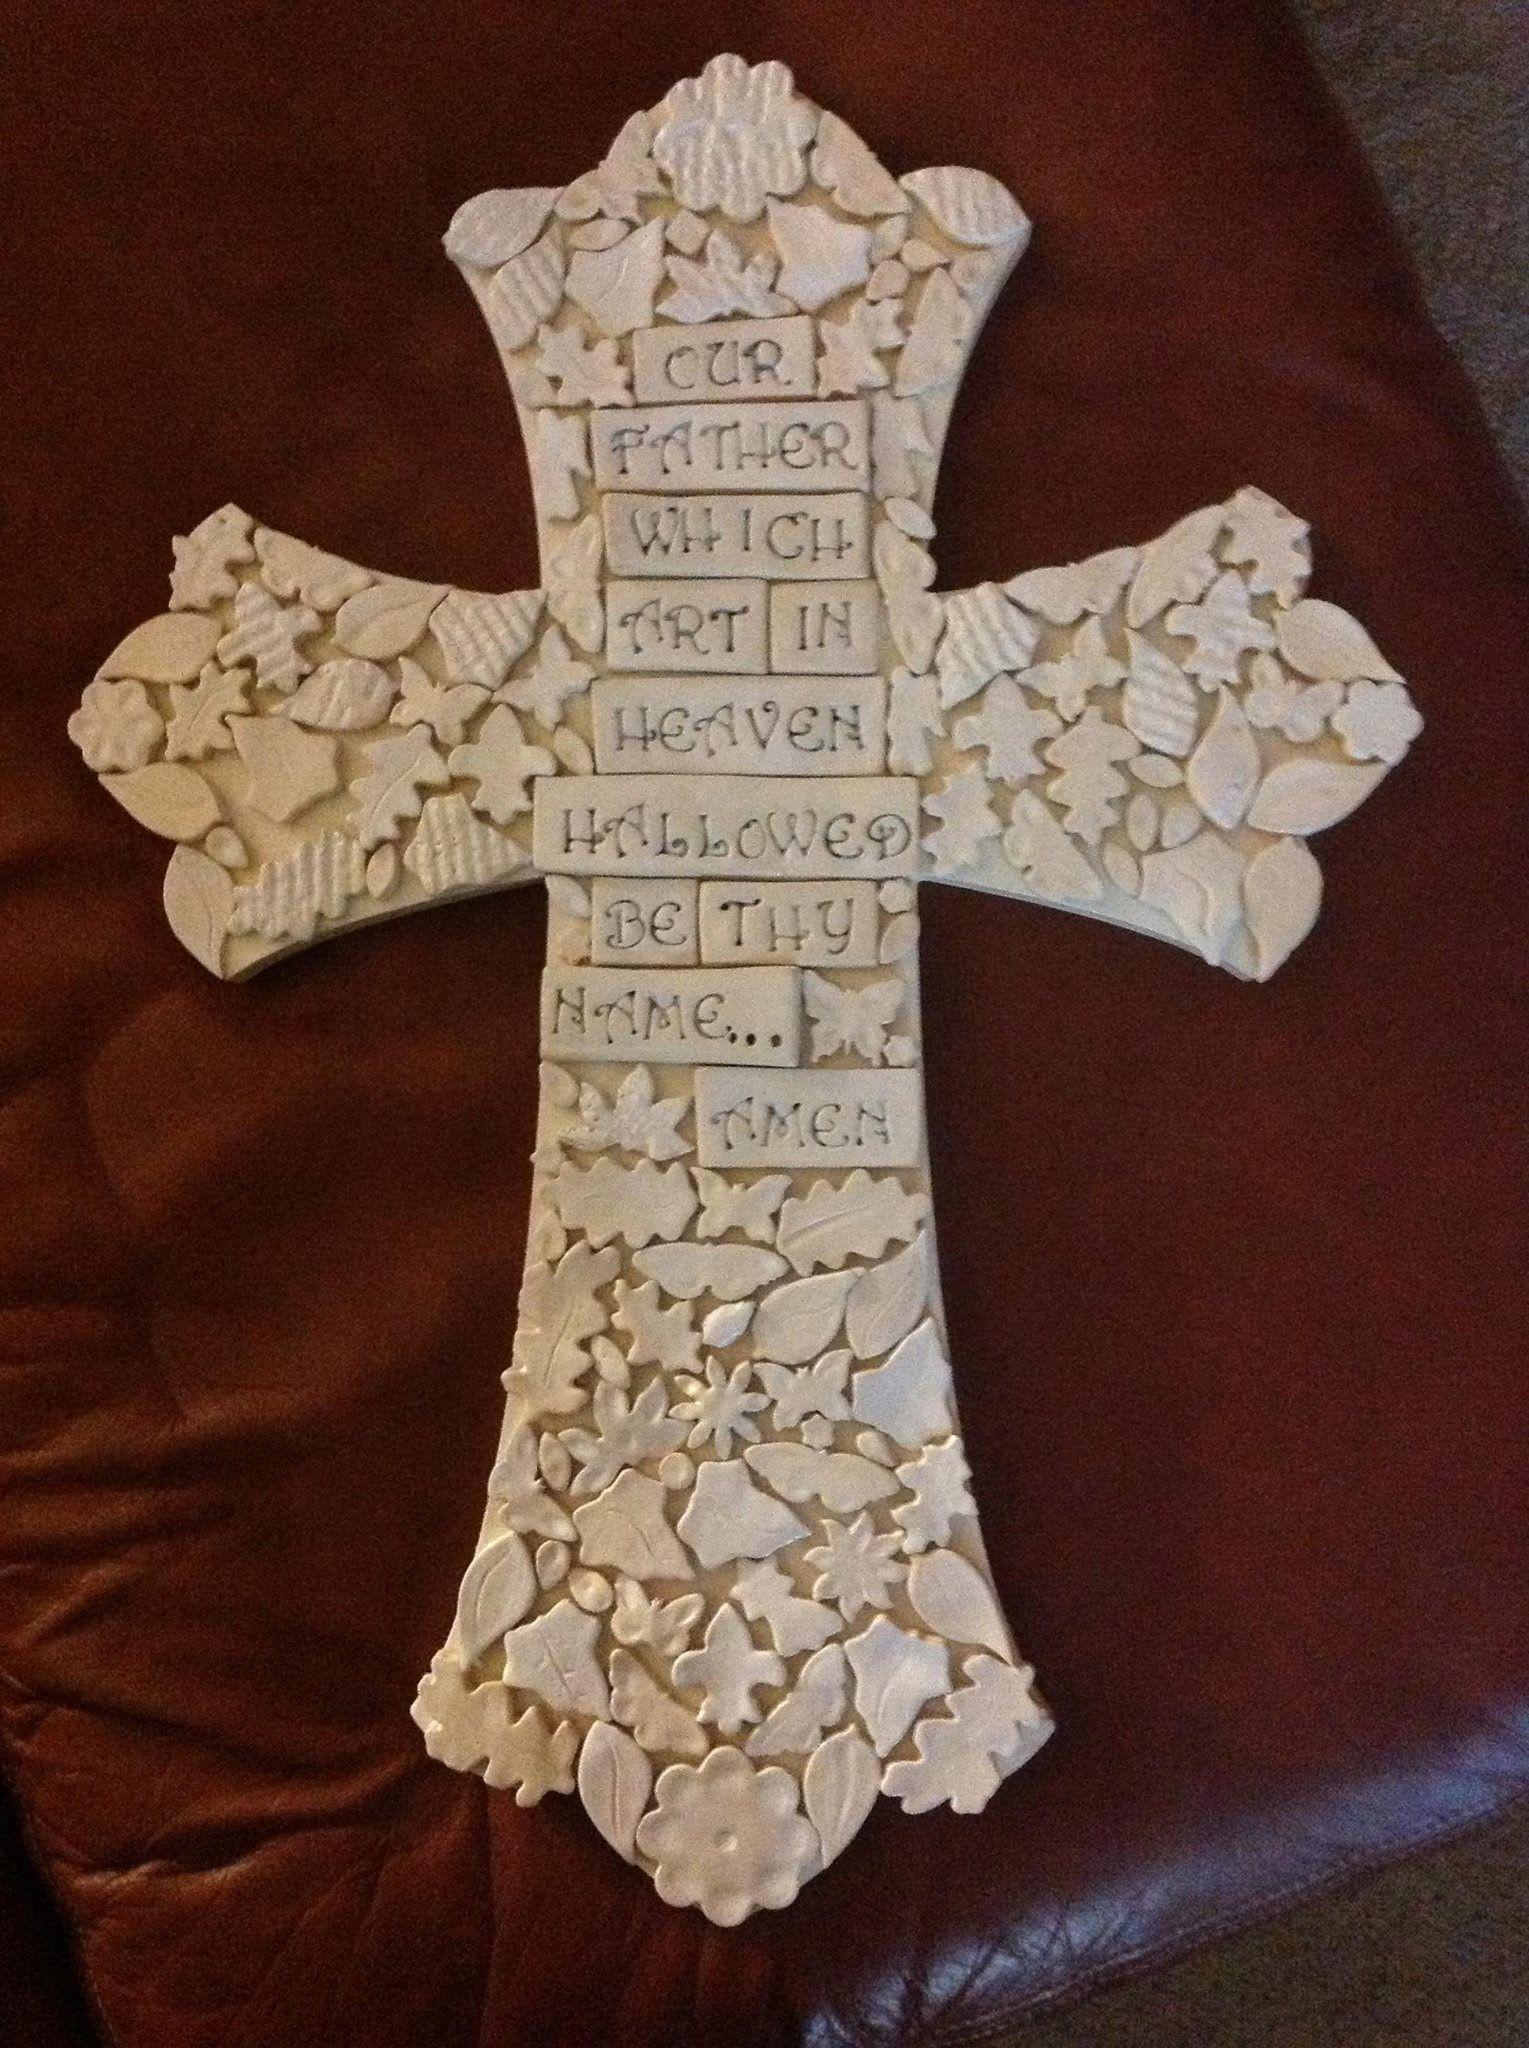 Handmade stoneware tiles on a wooden cross